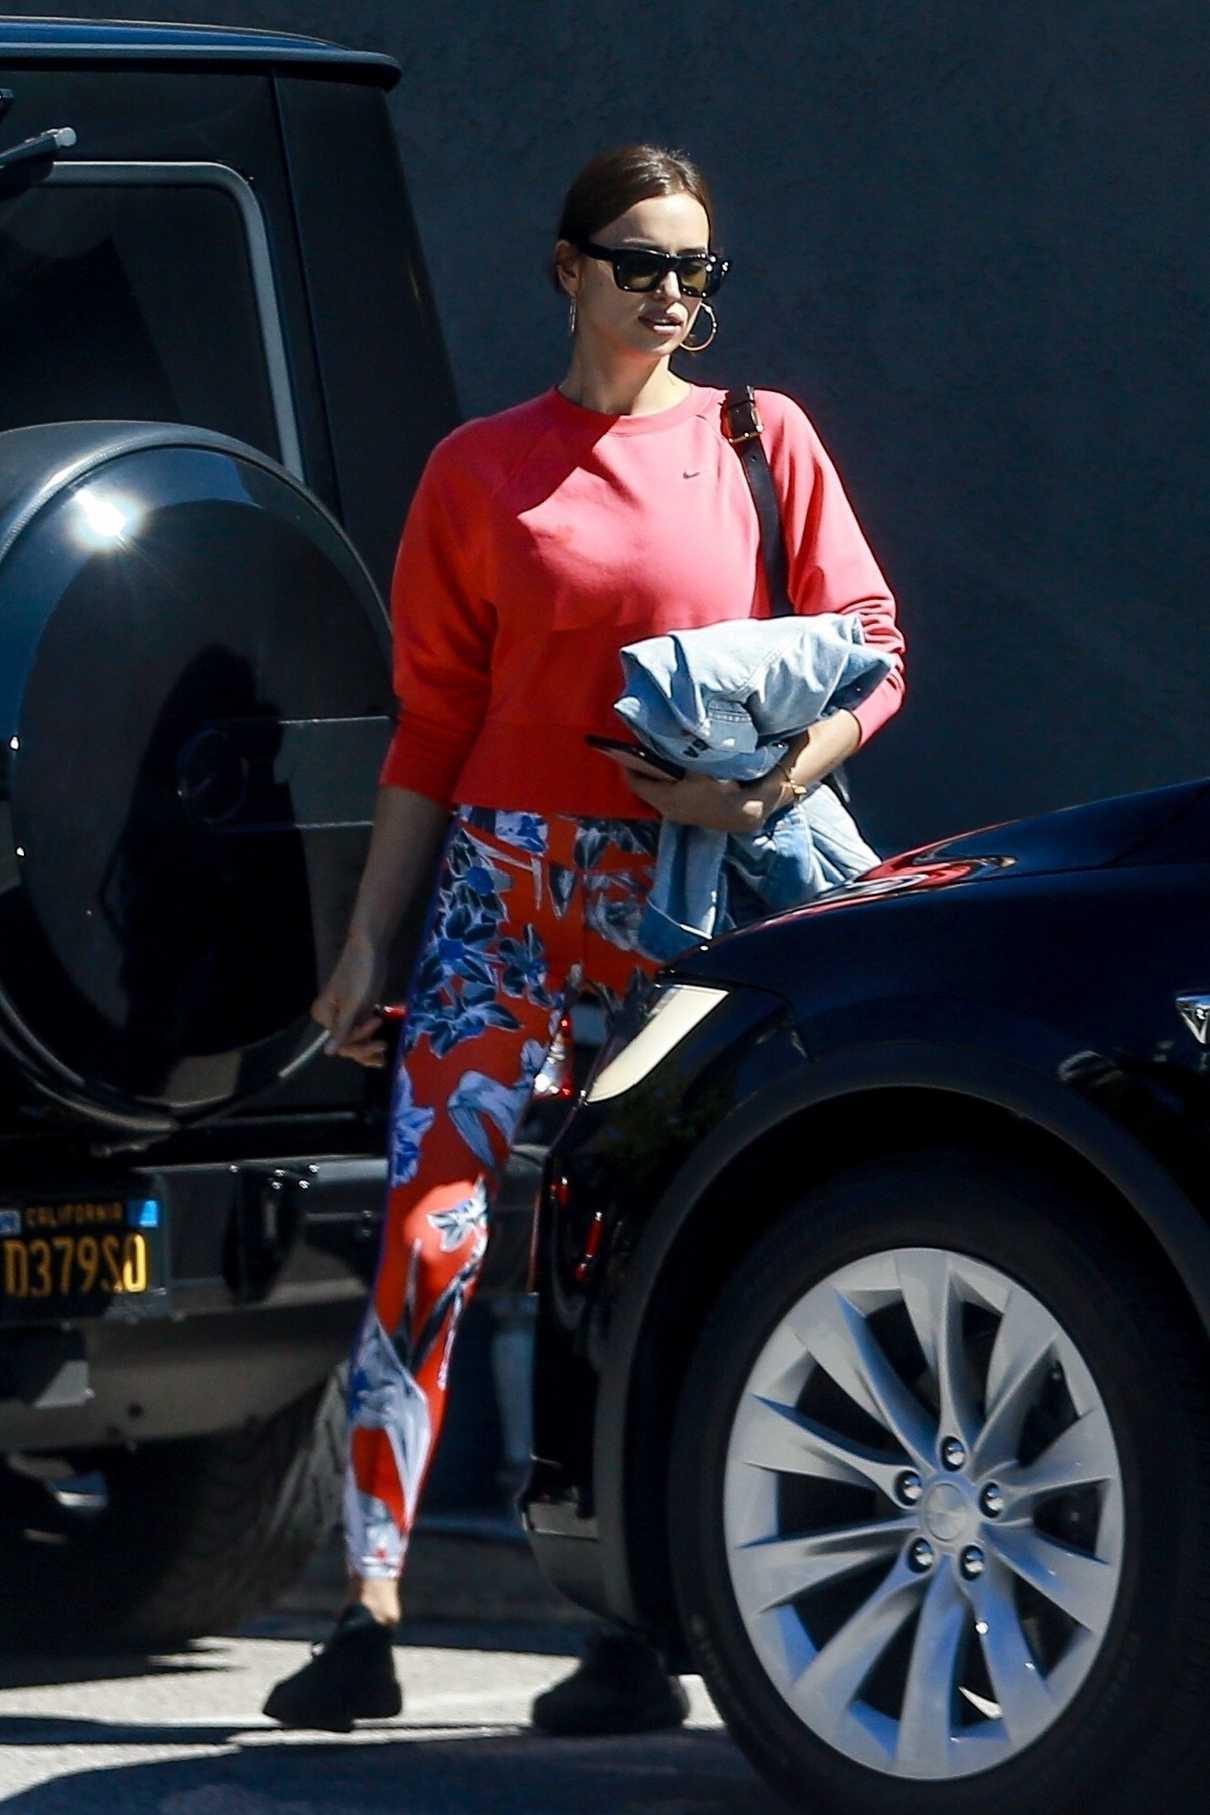 Irina Shayk in a Red Nike Sweatshirt